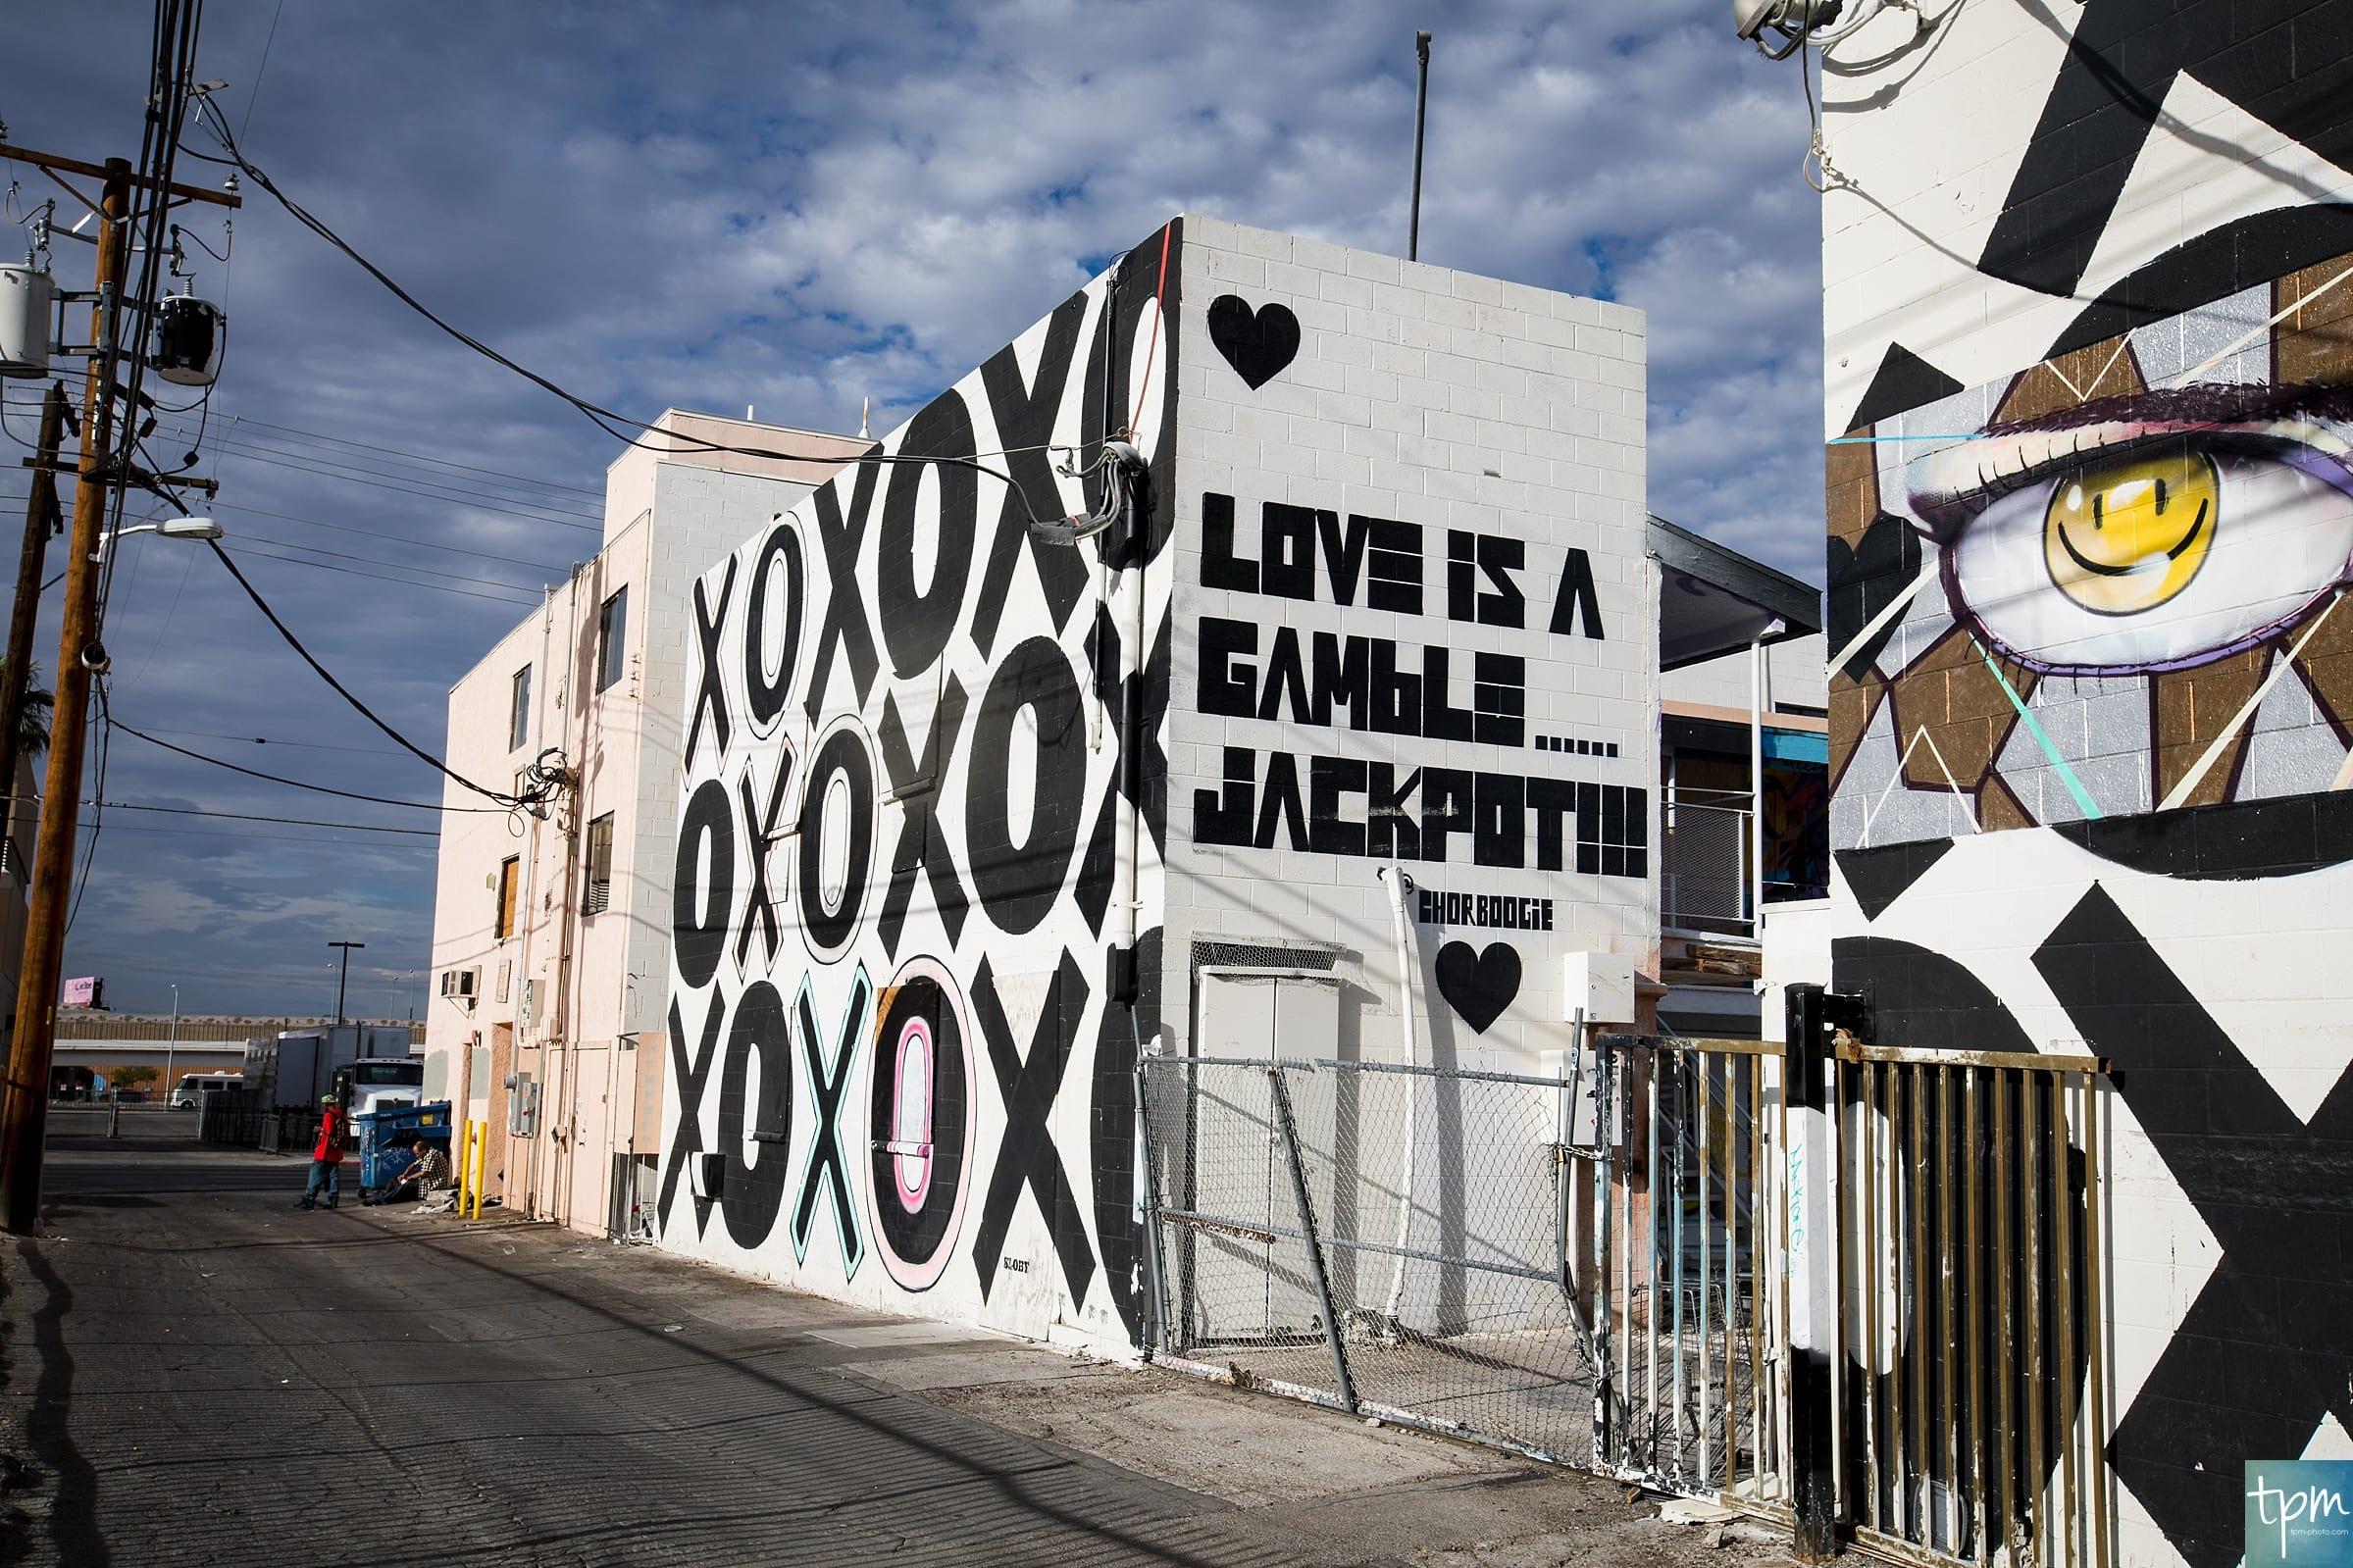 ChorBoogie, Love is a Gamble...Jackpot!, Taylored Photo Memories, Las Vegas Murals